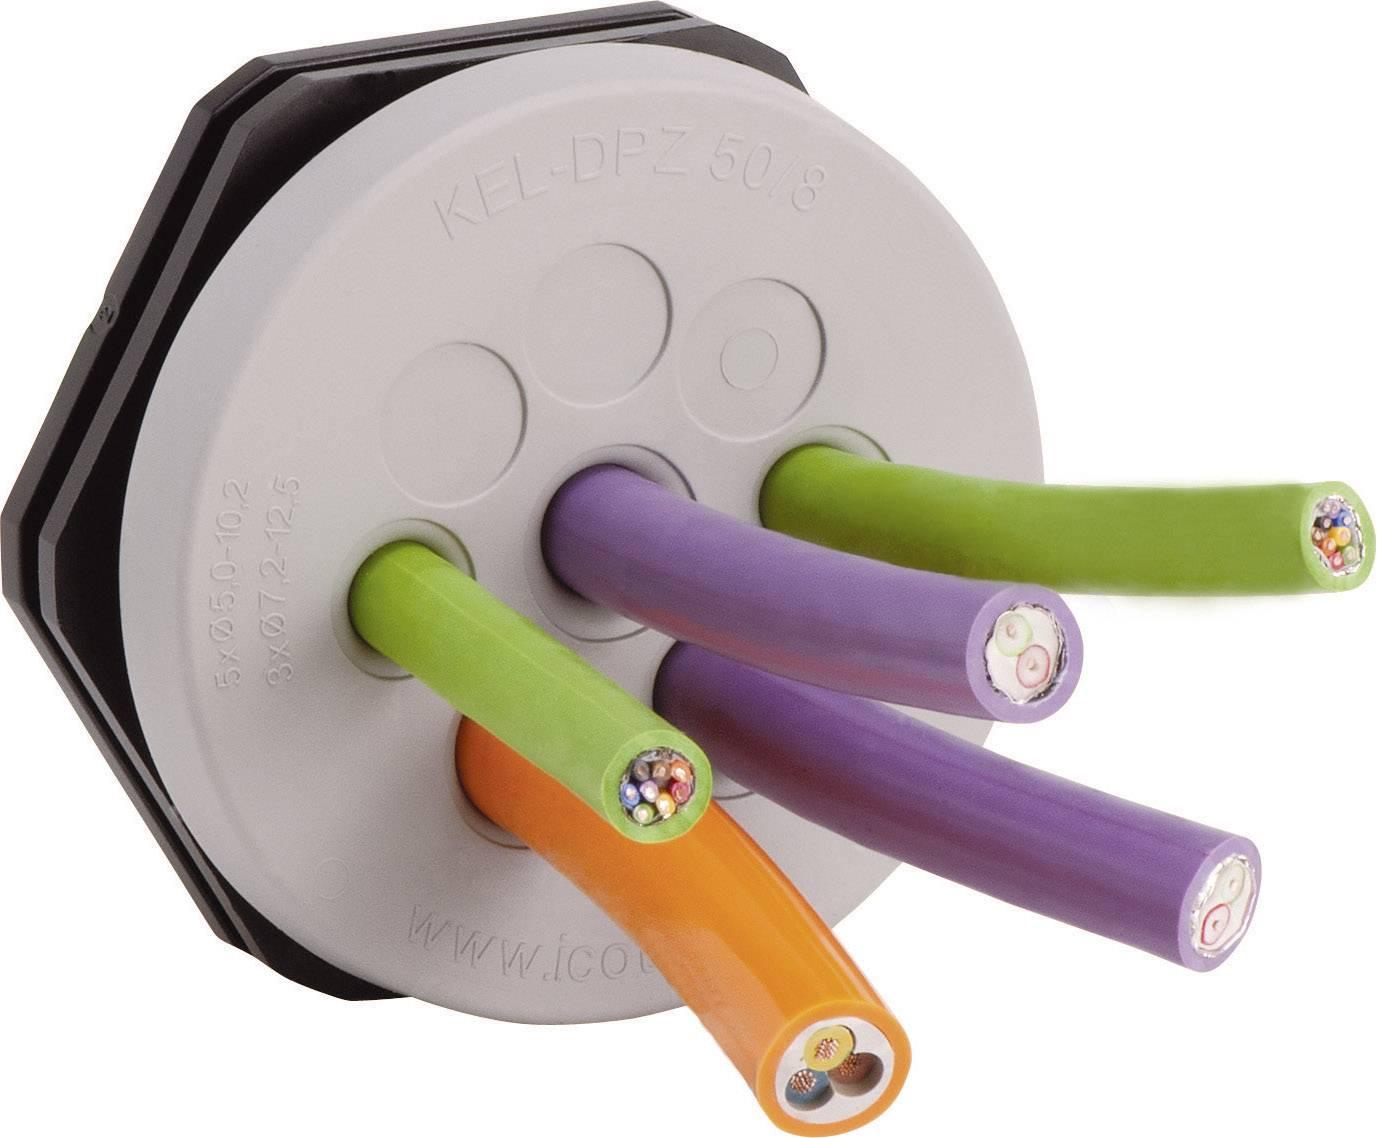 Icotek Uvodnica za kable KEL-DPZ okrogla KEL-DPZ 50 8 velikost: M50 poliamid/elastomer, siva